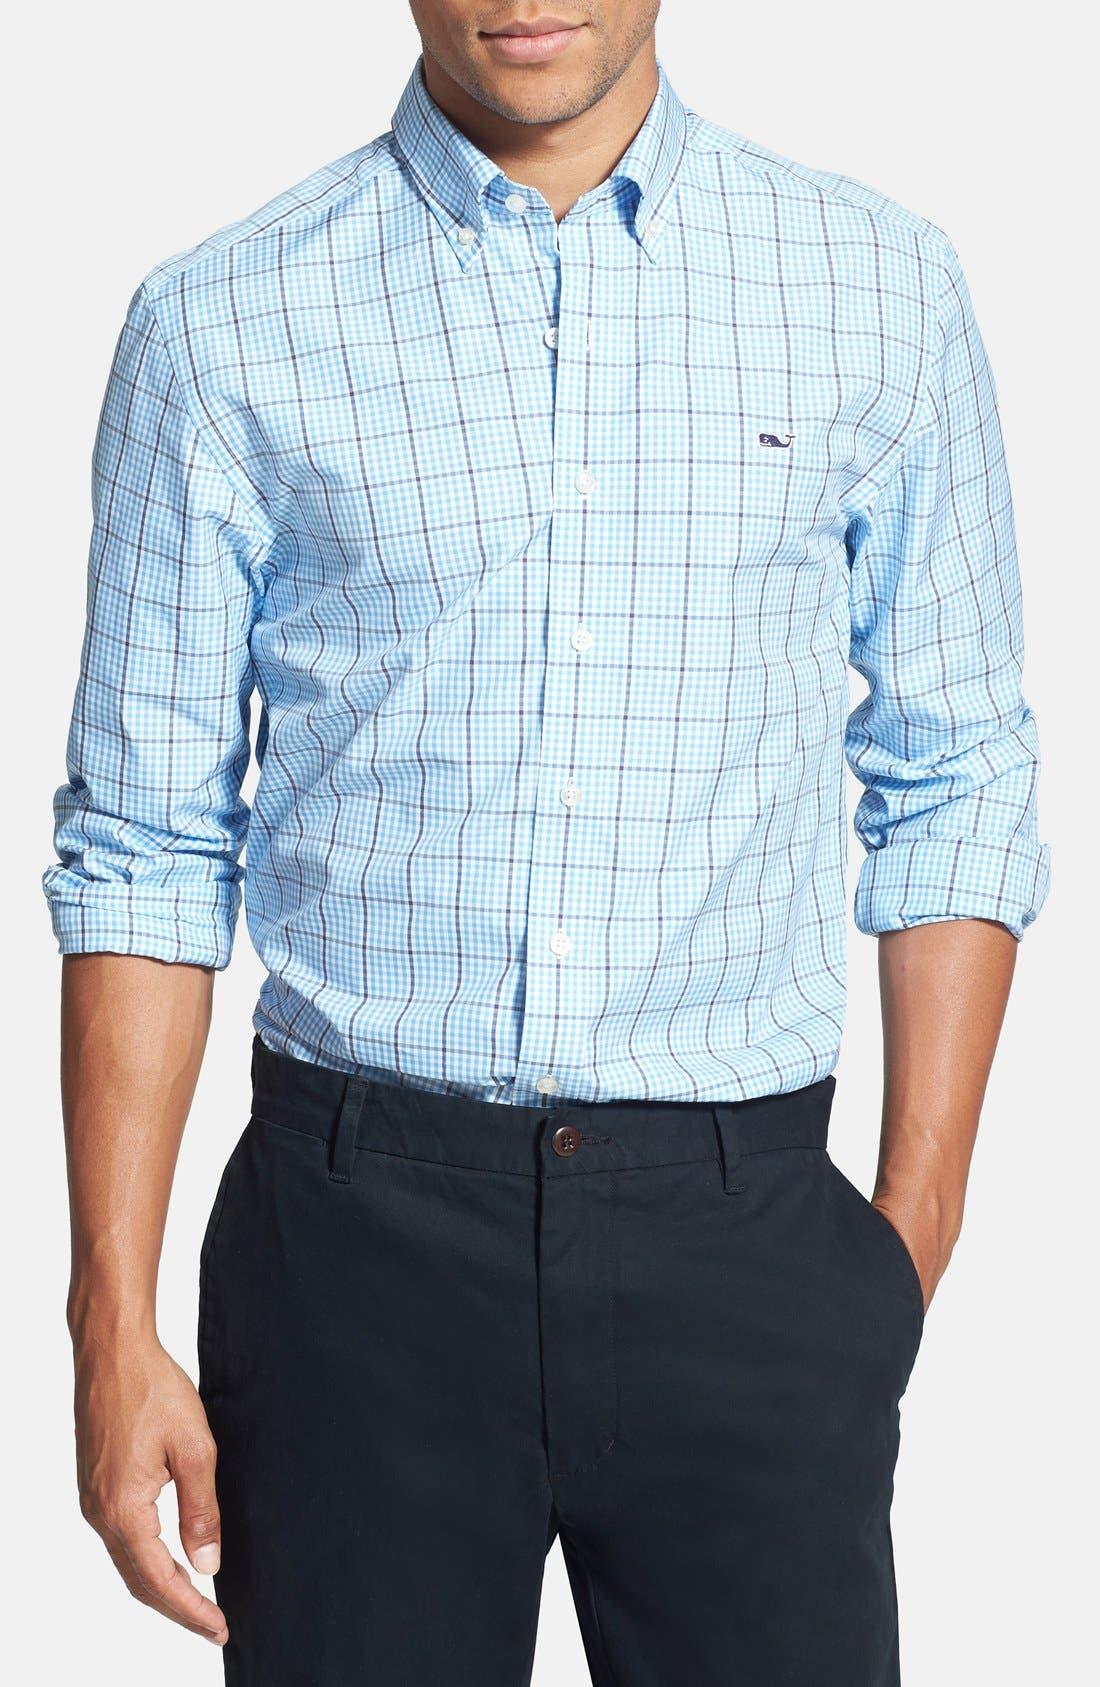 Main Image - Vineyard Vines 'Whale - Pembroke Plaid' Regular Fit Sport Shirt